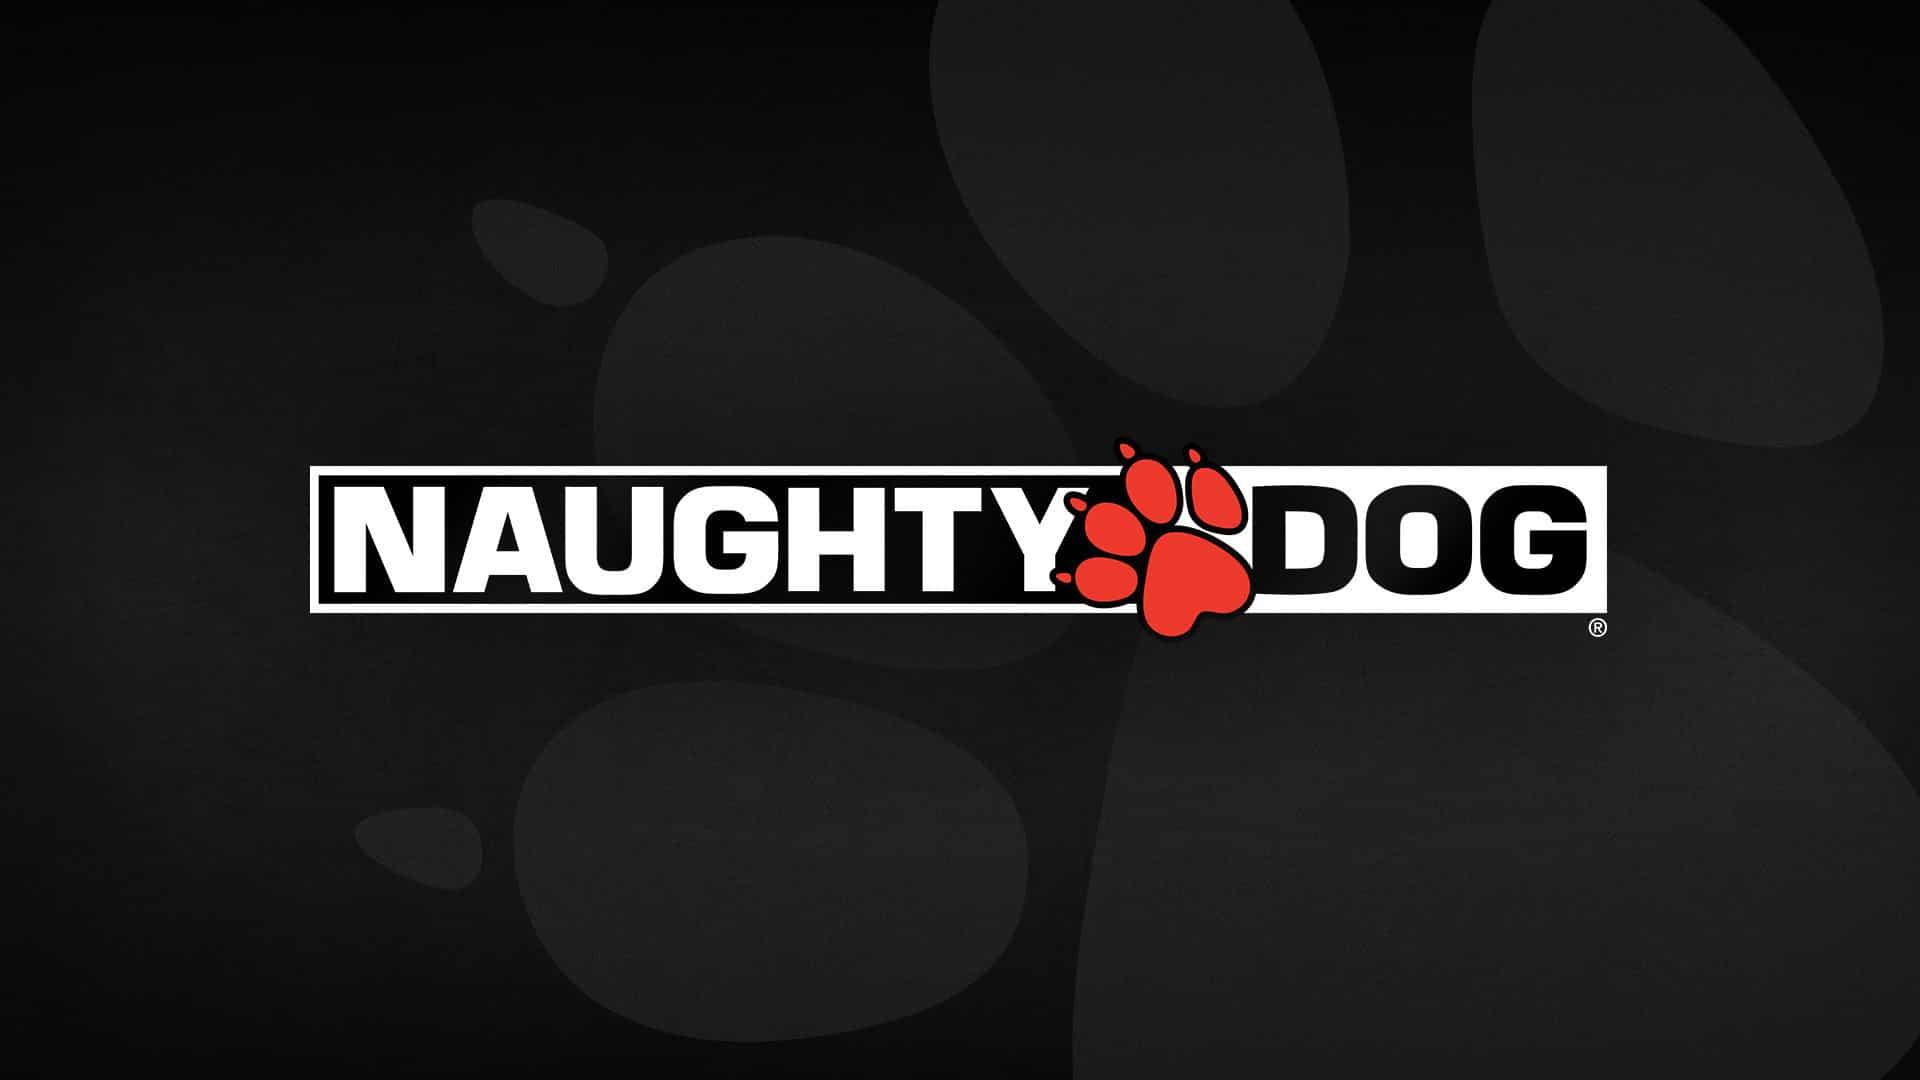 Naughty Dog Multiplayer Game